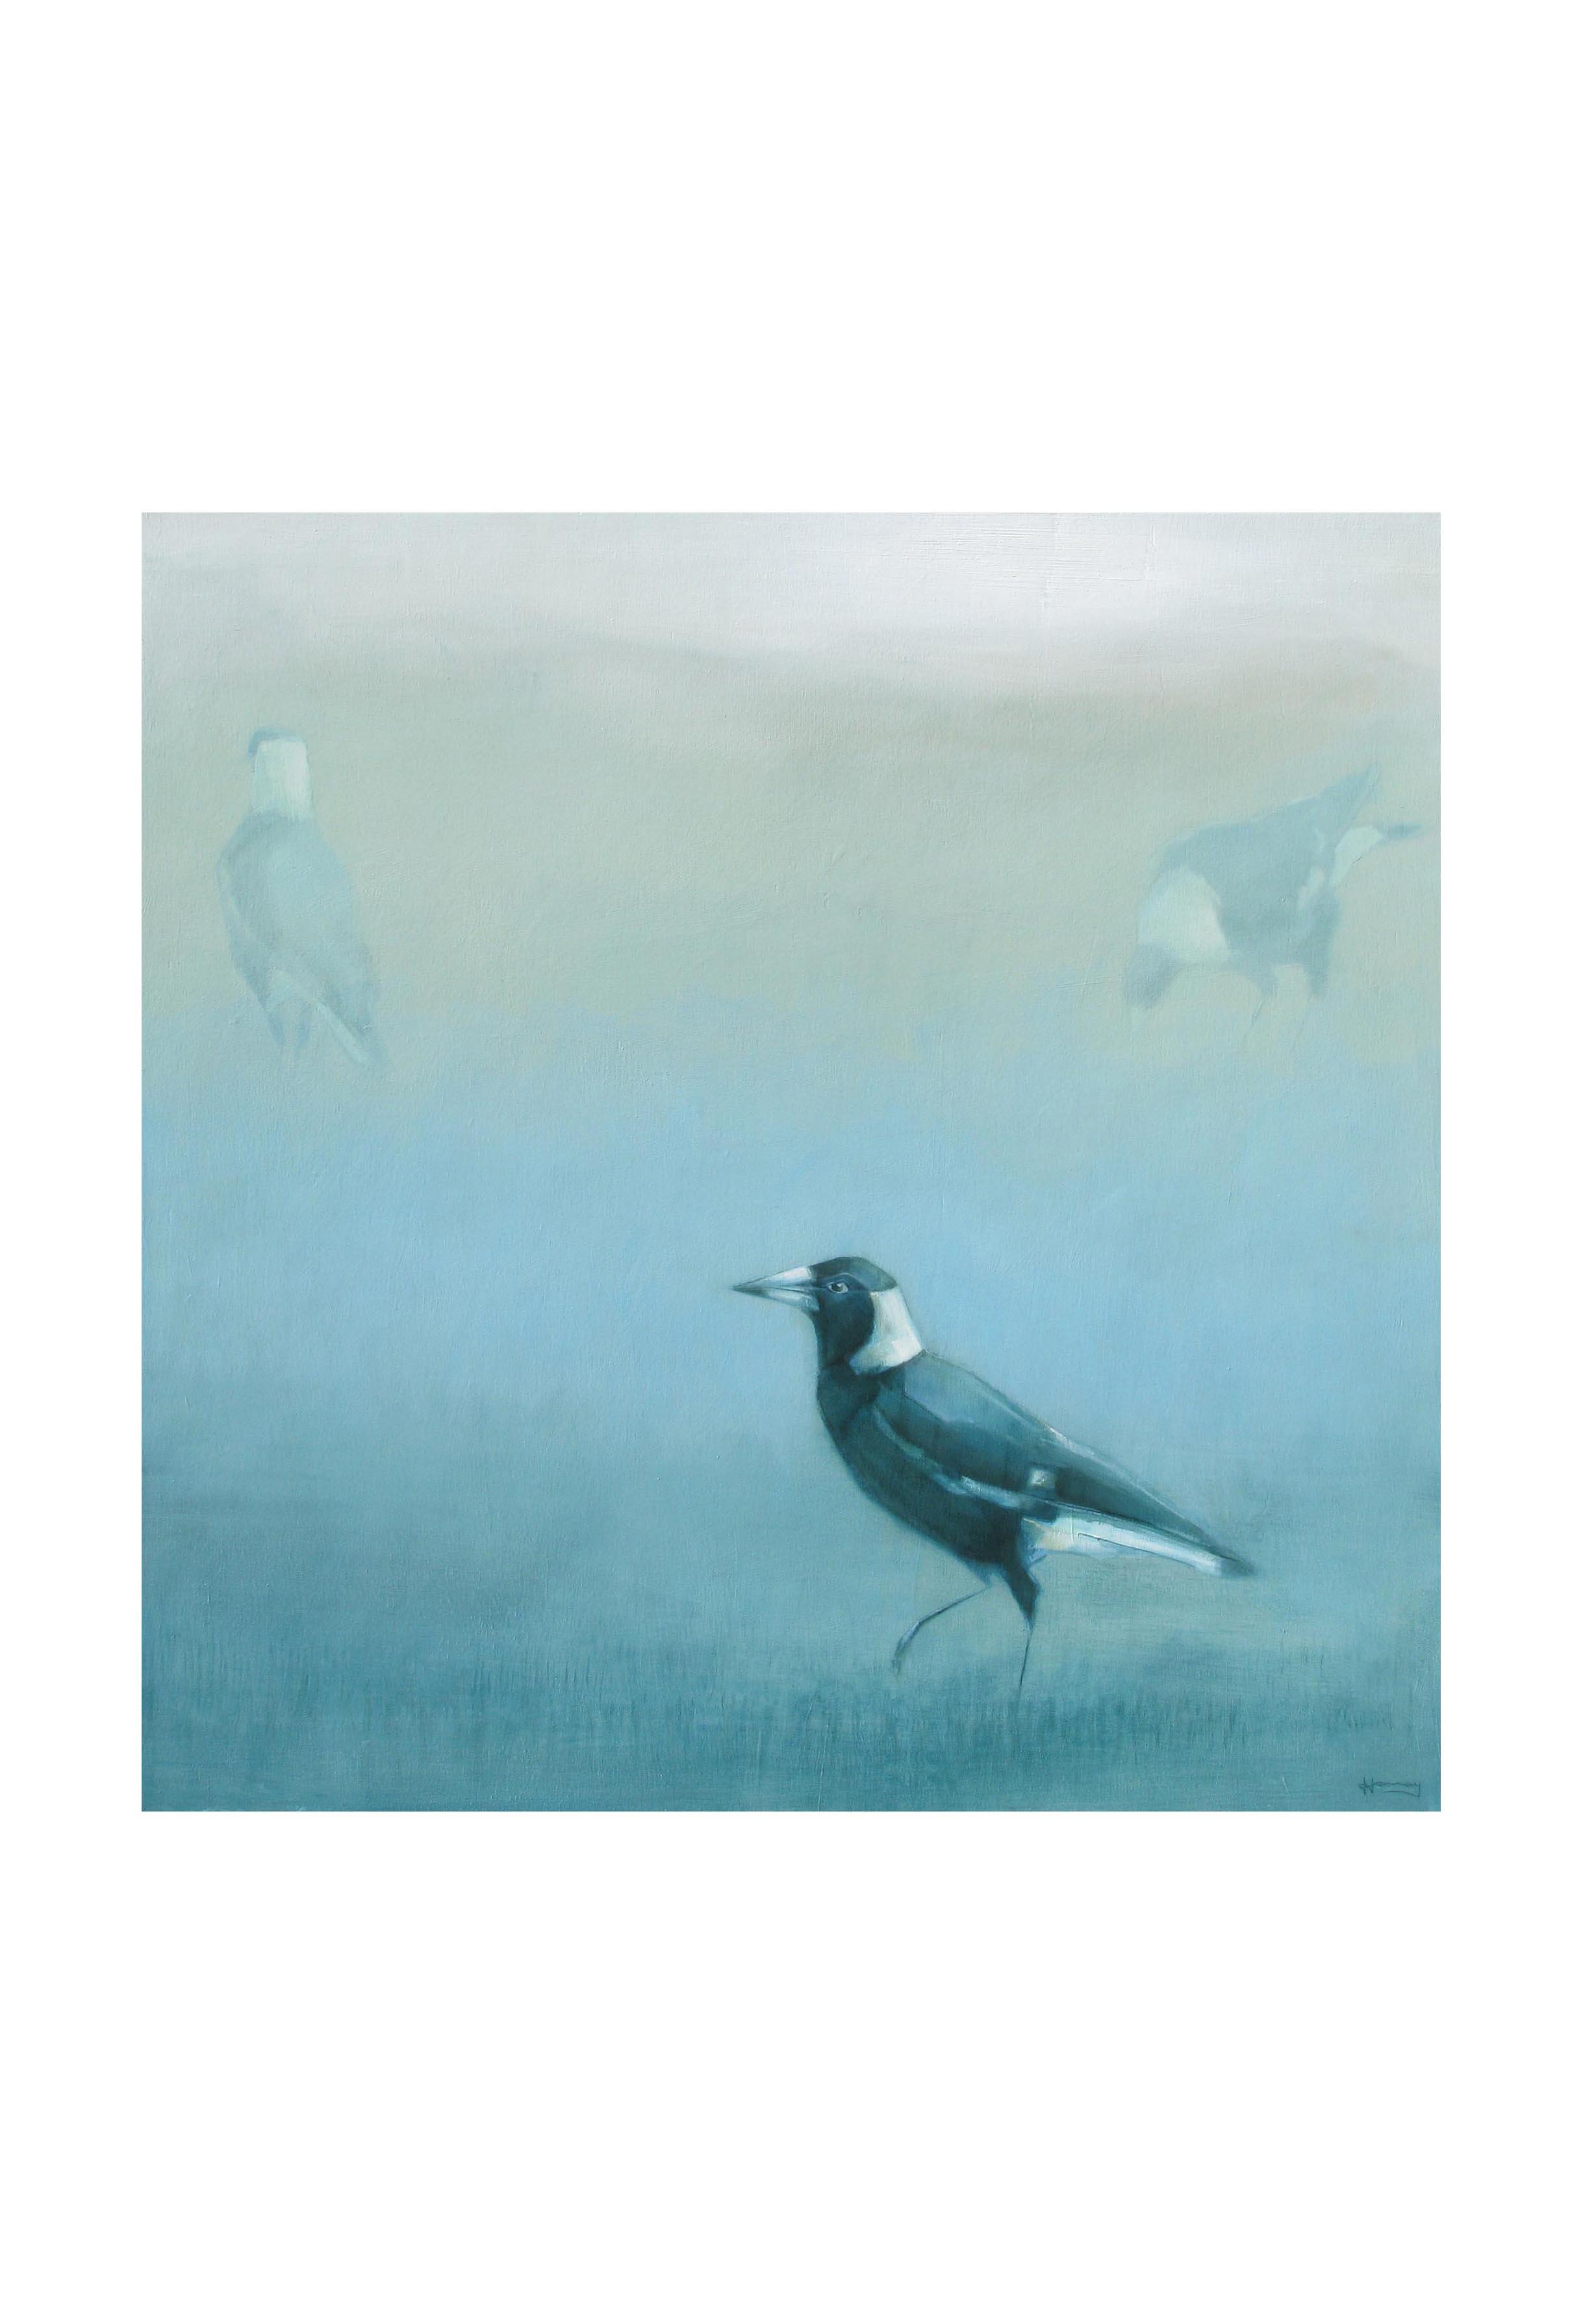 'Walk this Way'- Carmen Hannay